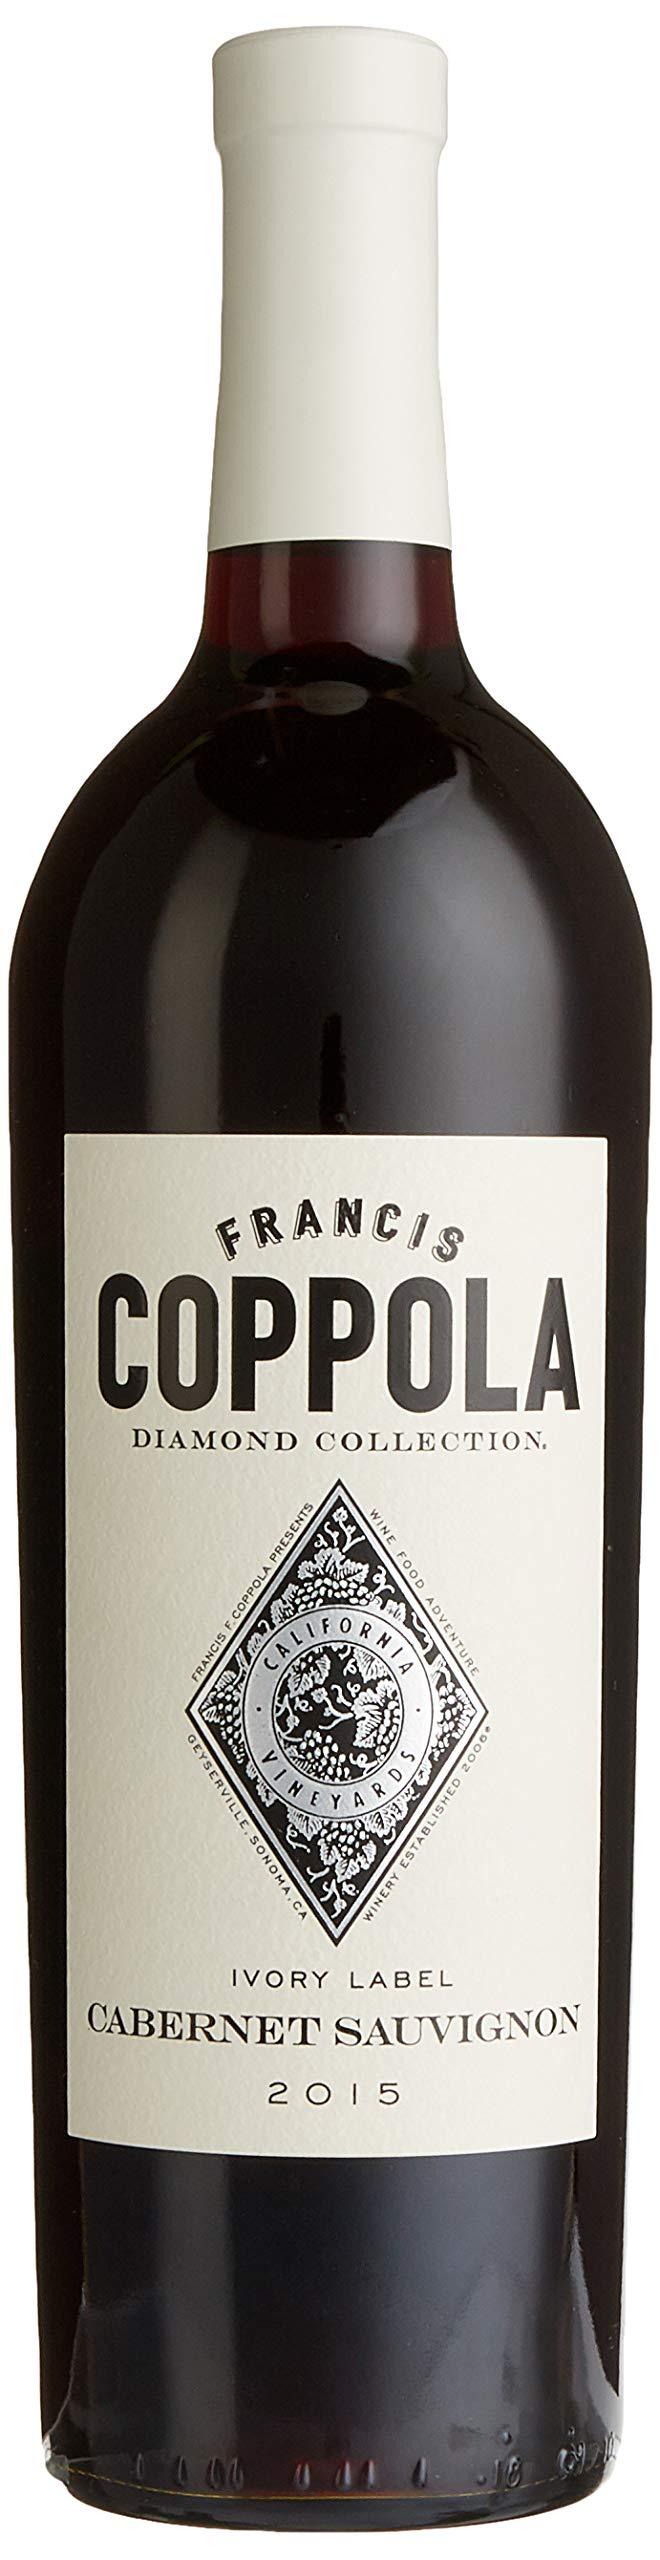 Francis-Ford-Coppola-Diamond-Collection-Ivory-Cabernet-Sauvignon-2015-trocken-1-x-075-l